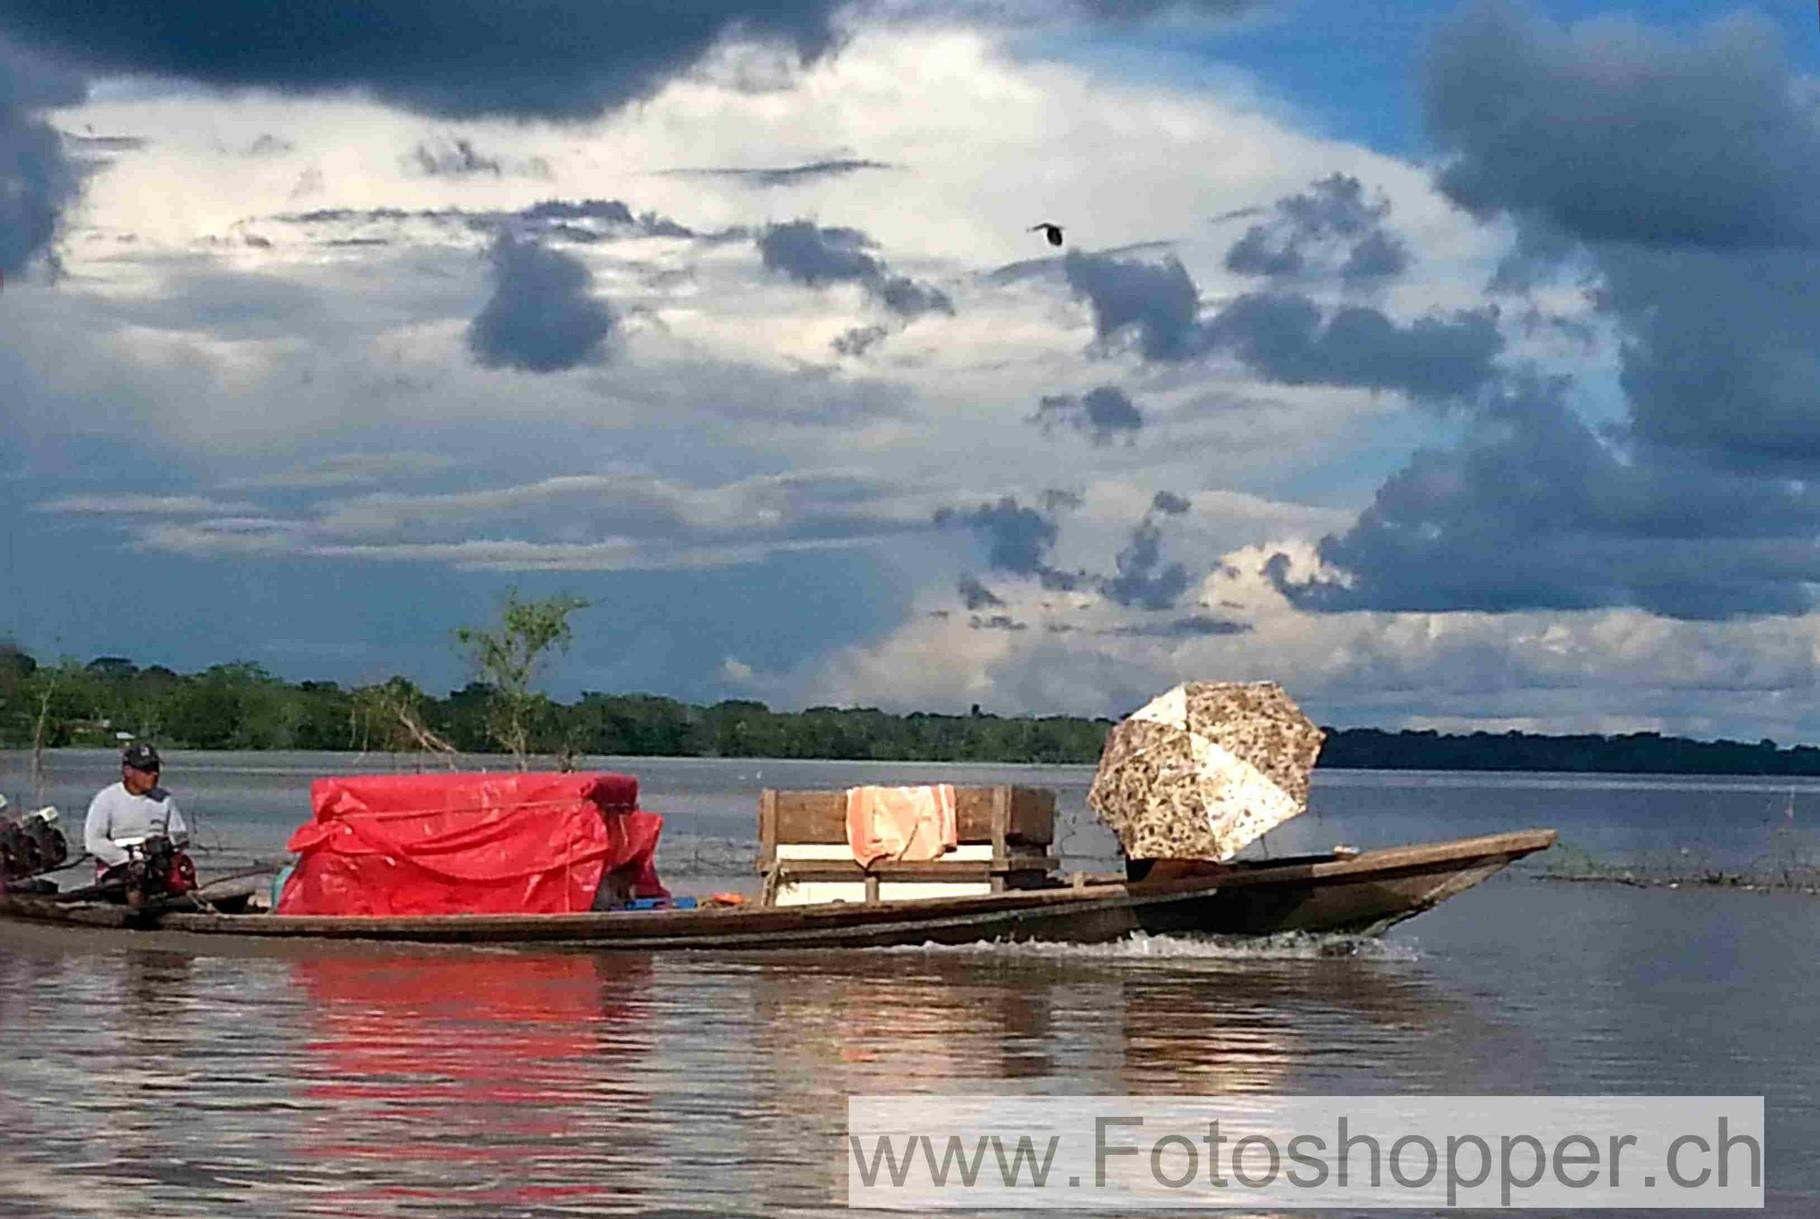 Gütertransport auf dem Amazonas